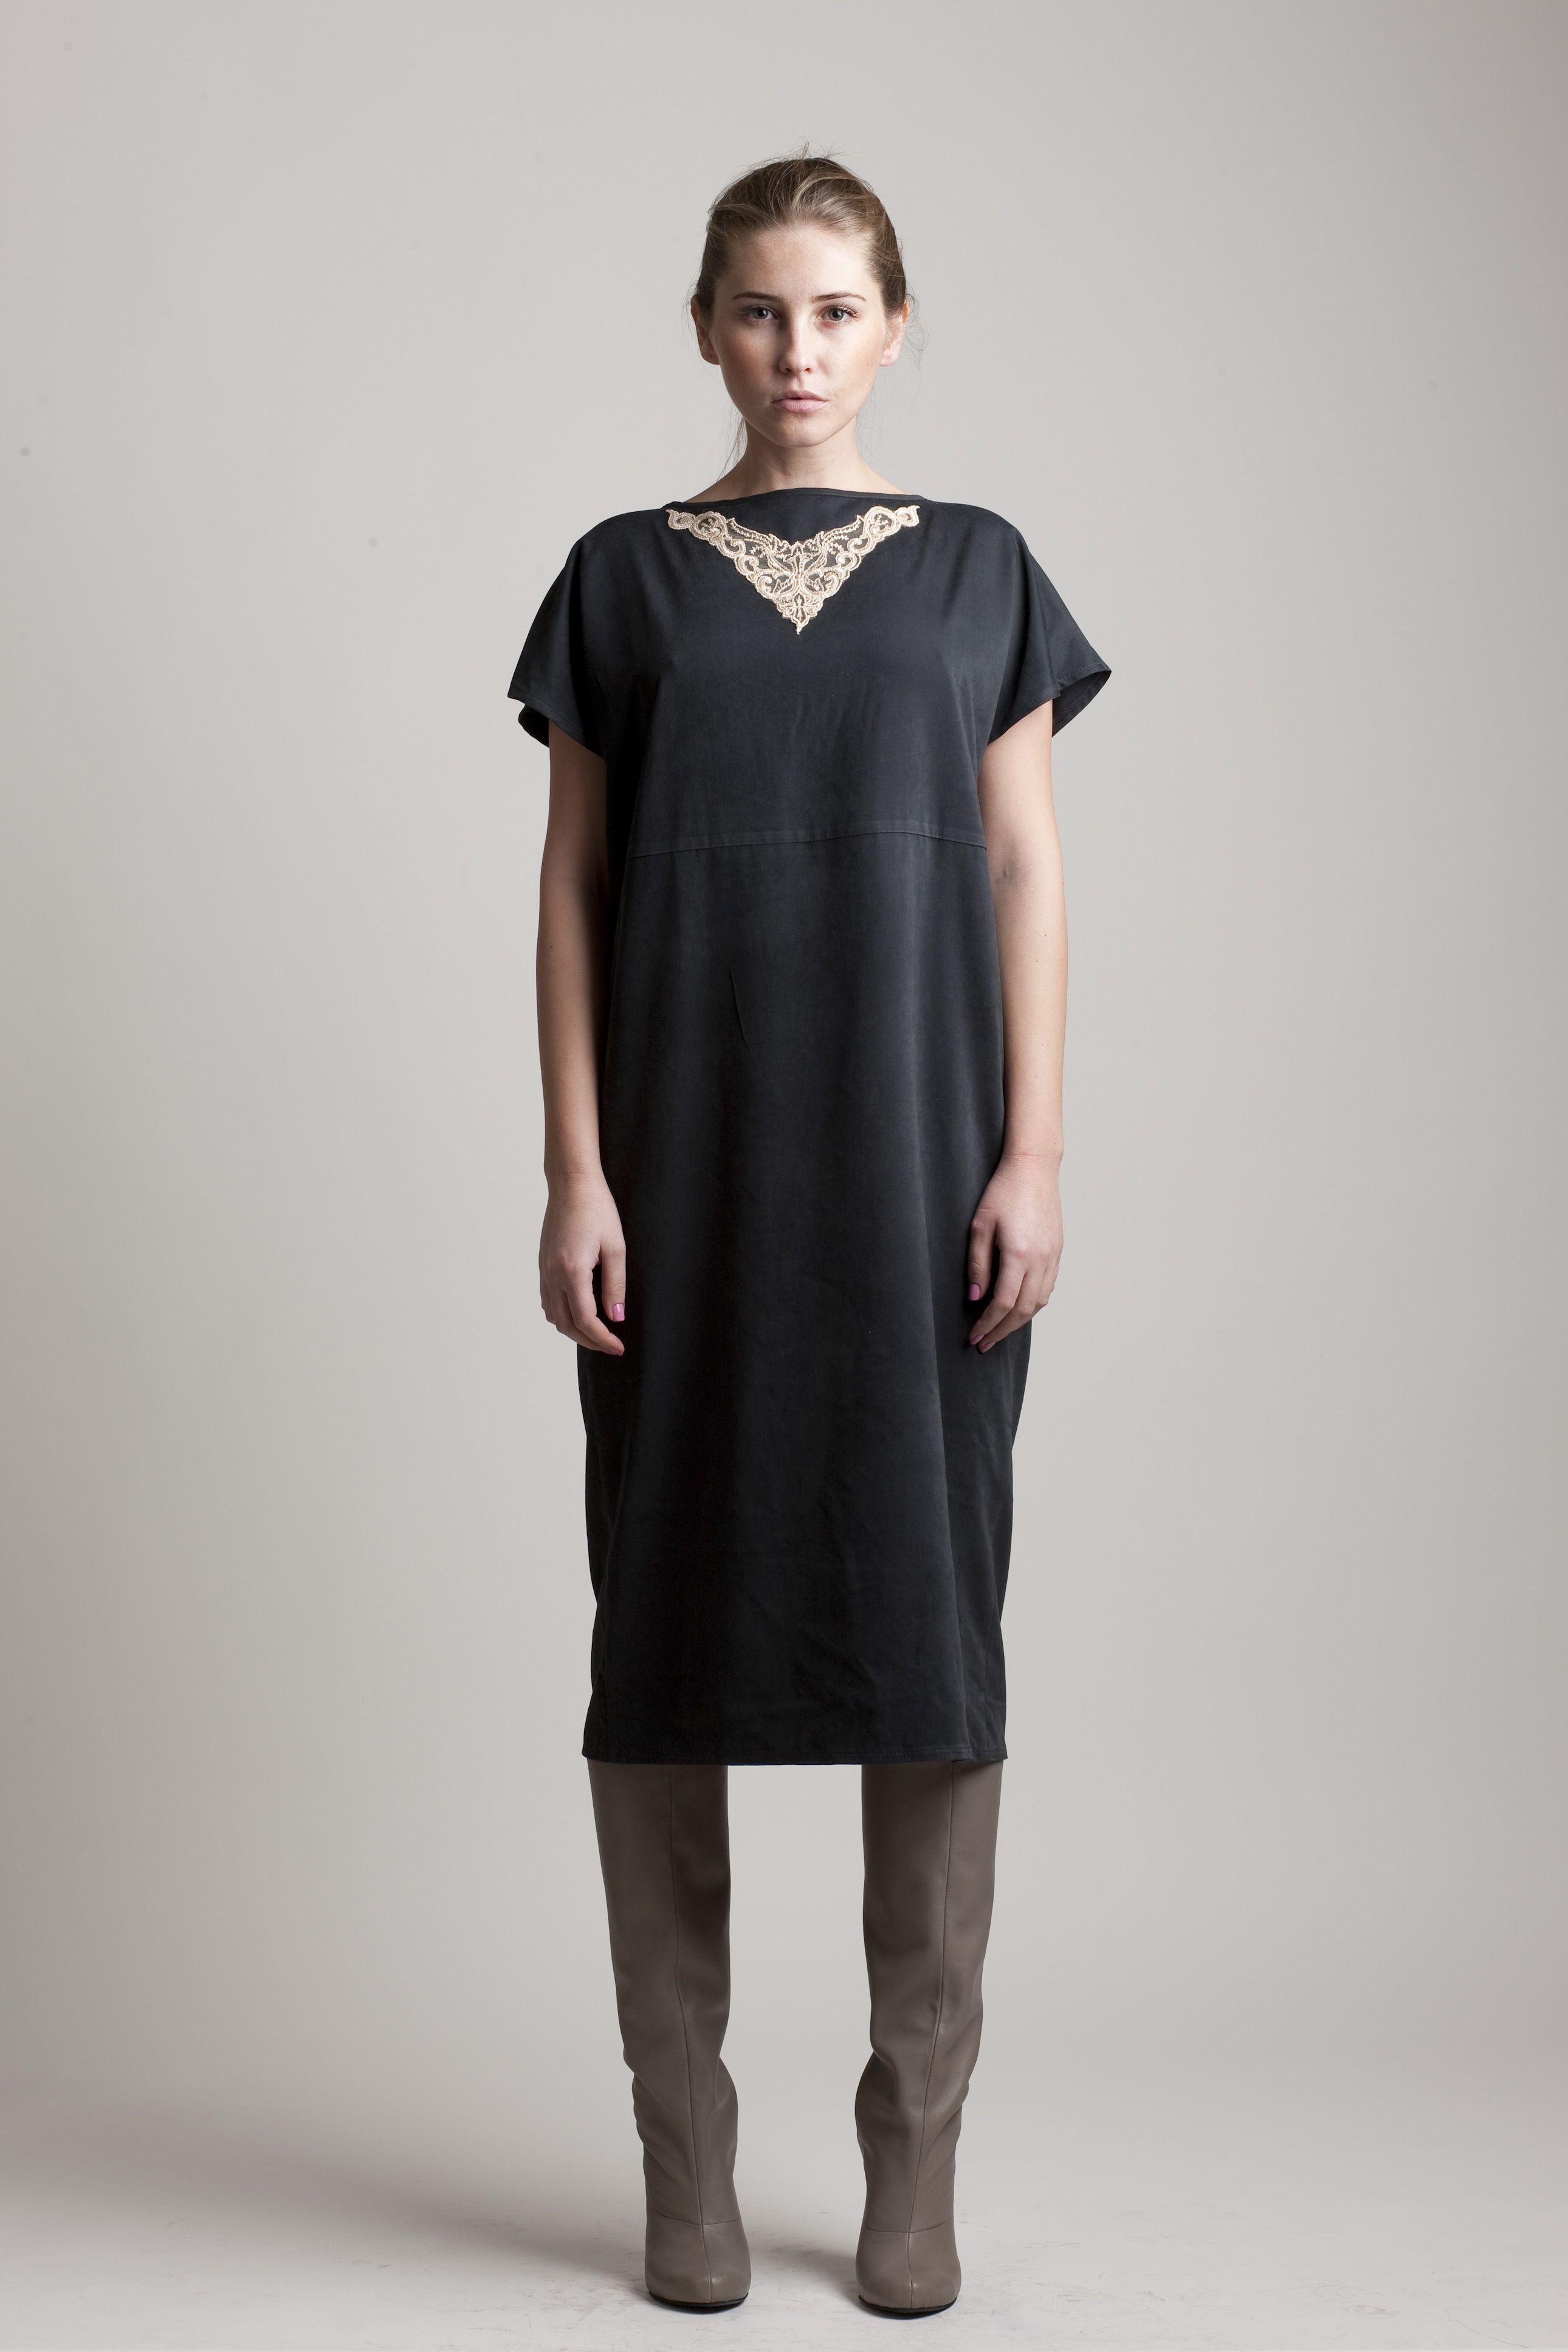 DRESSES - Knee-length dresses Macrí Free Shipping 2018 Yr5ynA